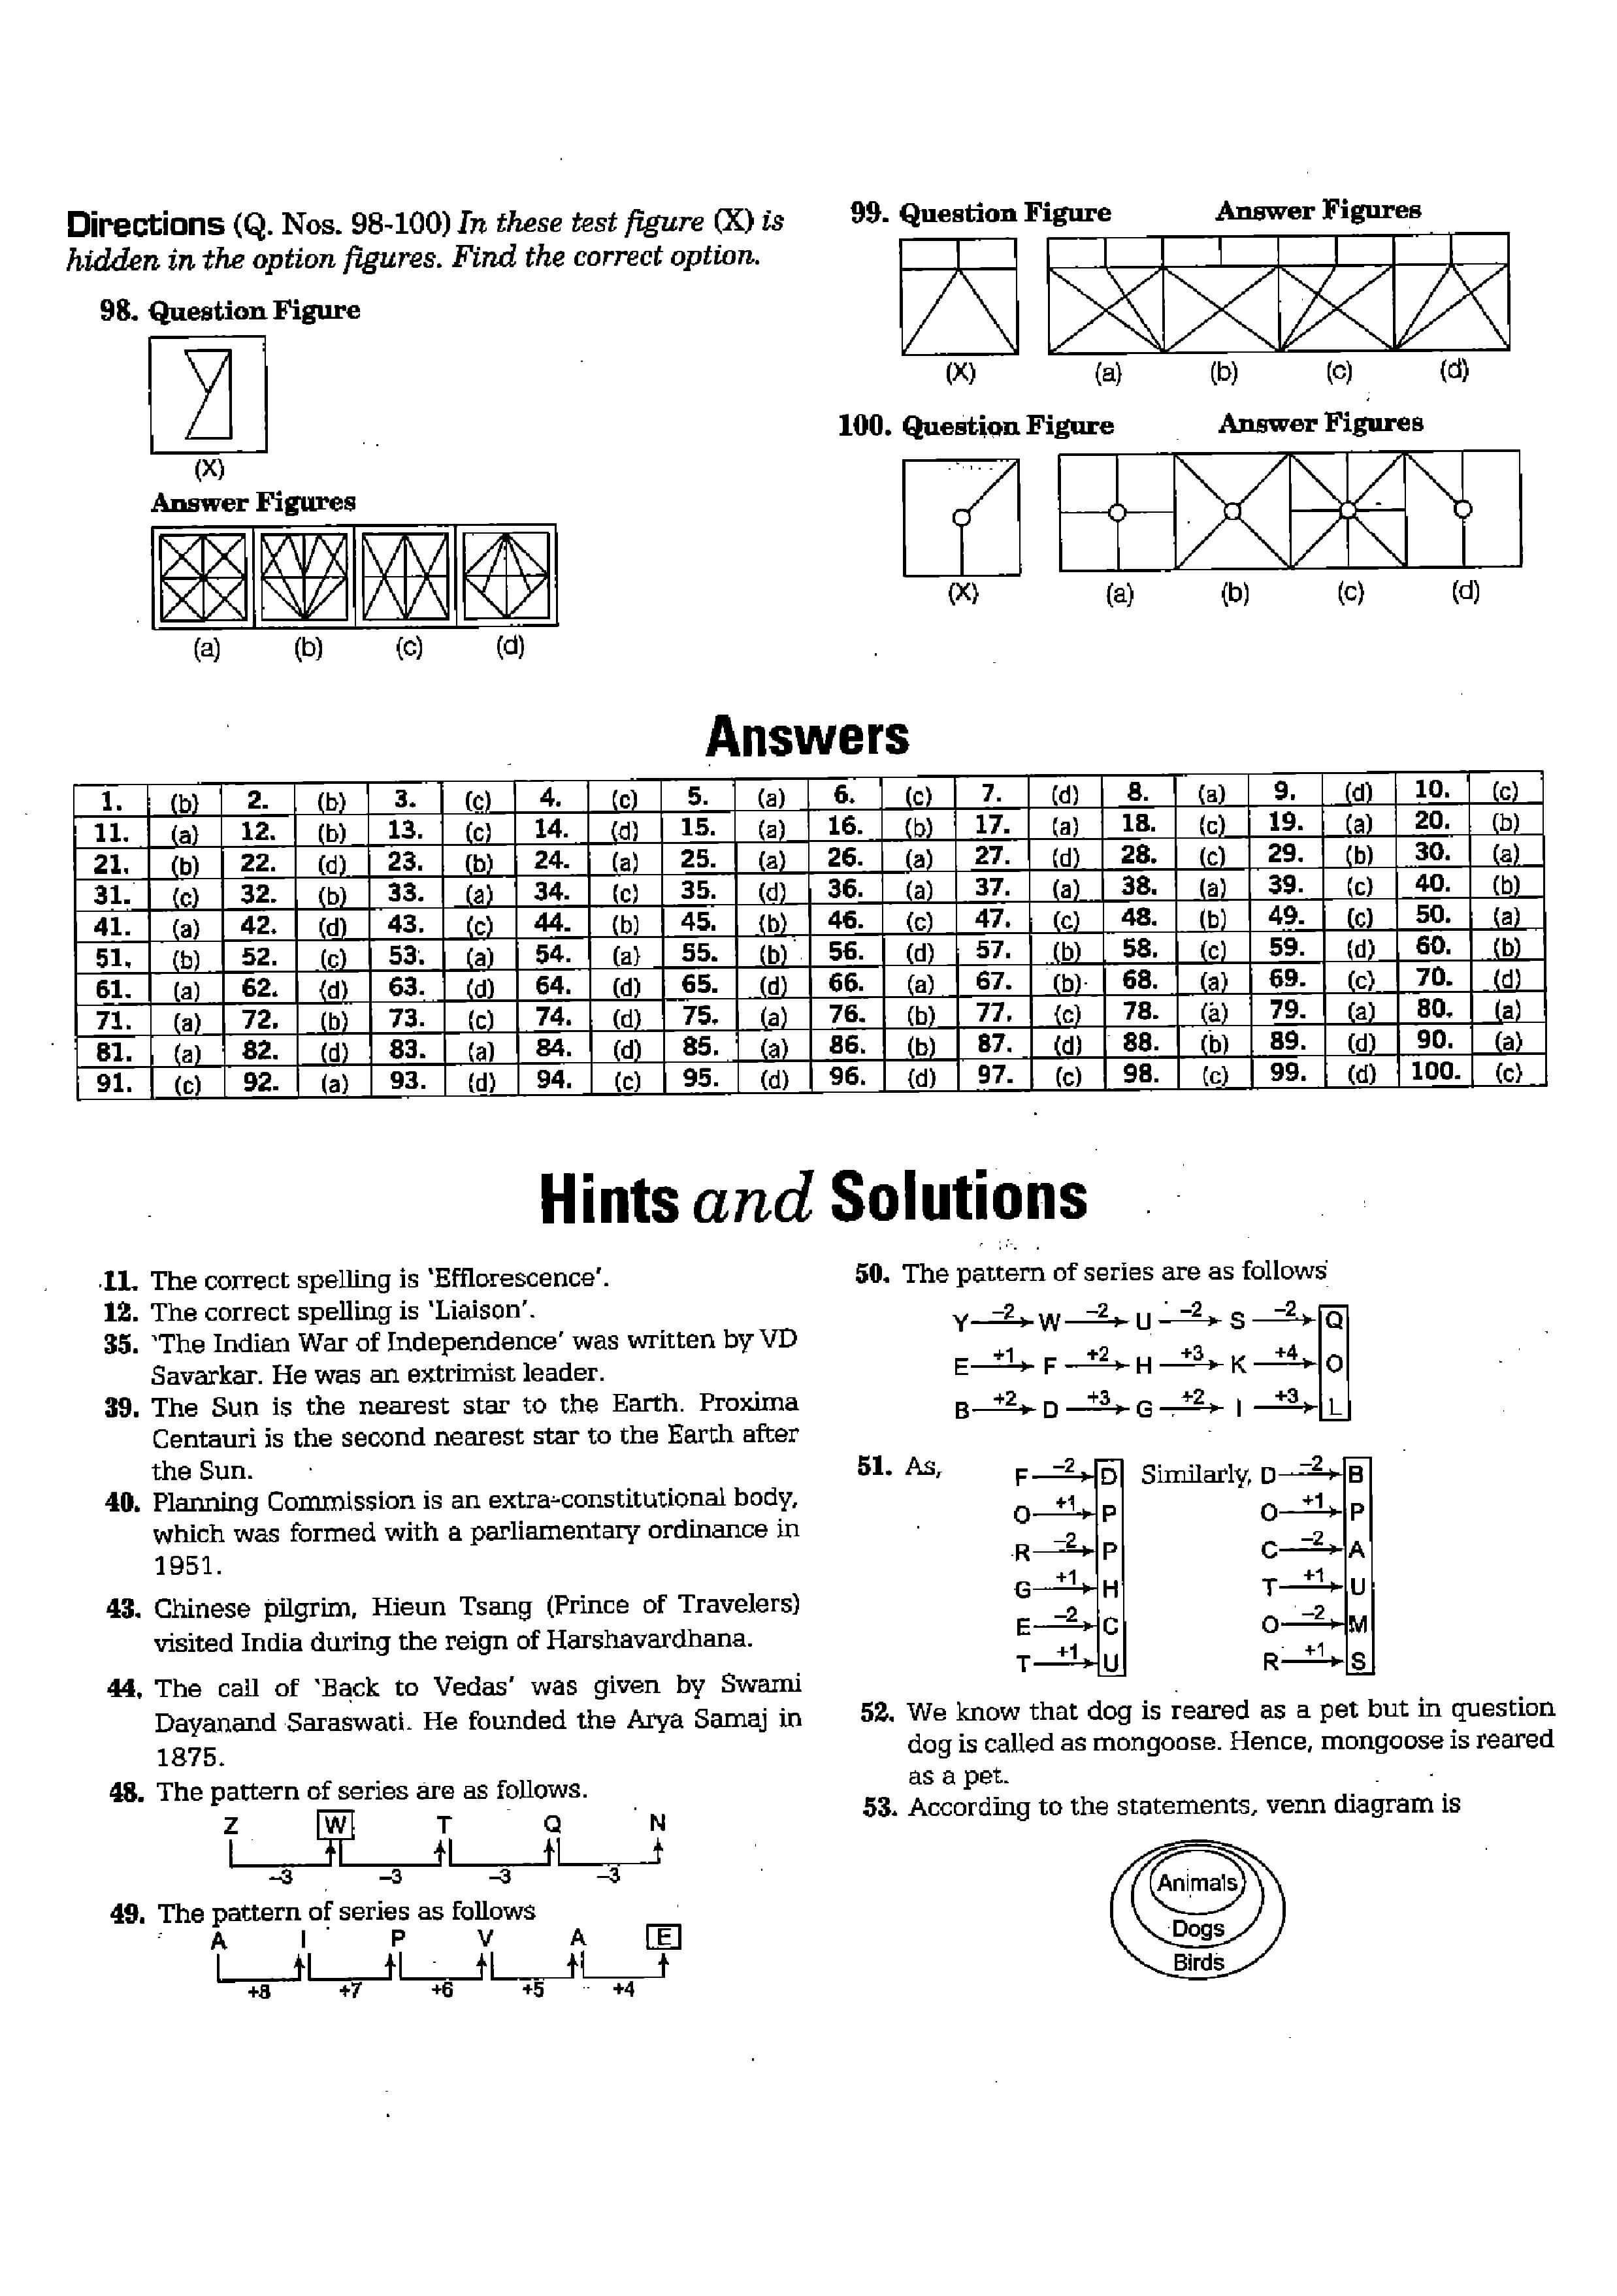 AFCAT 2 2020 Question Paper solved 06